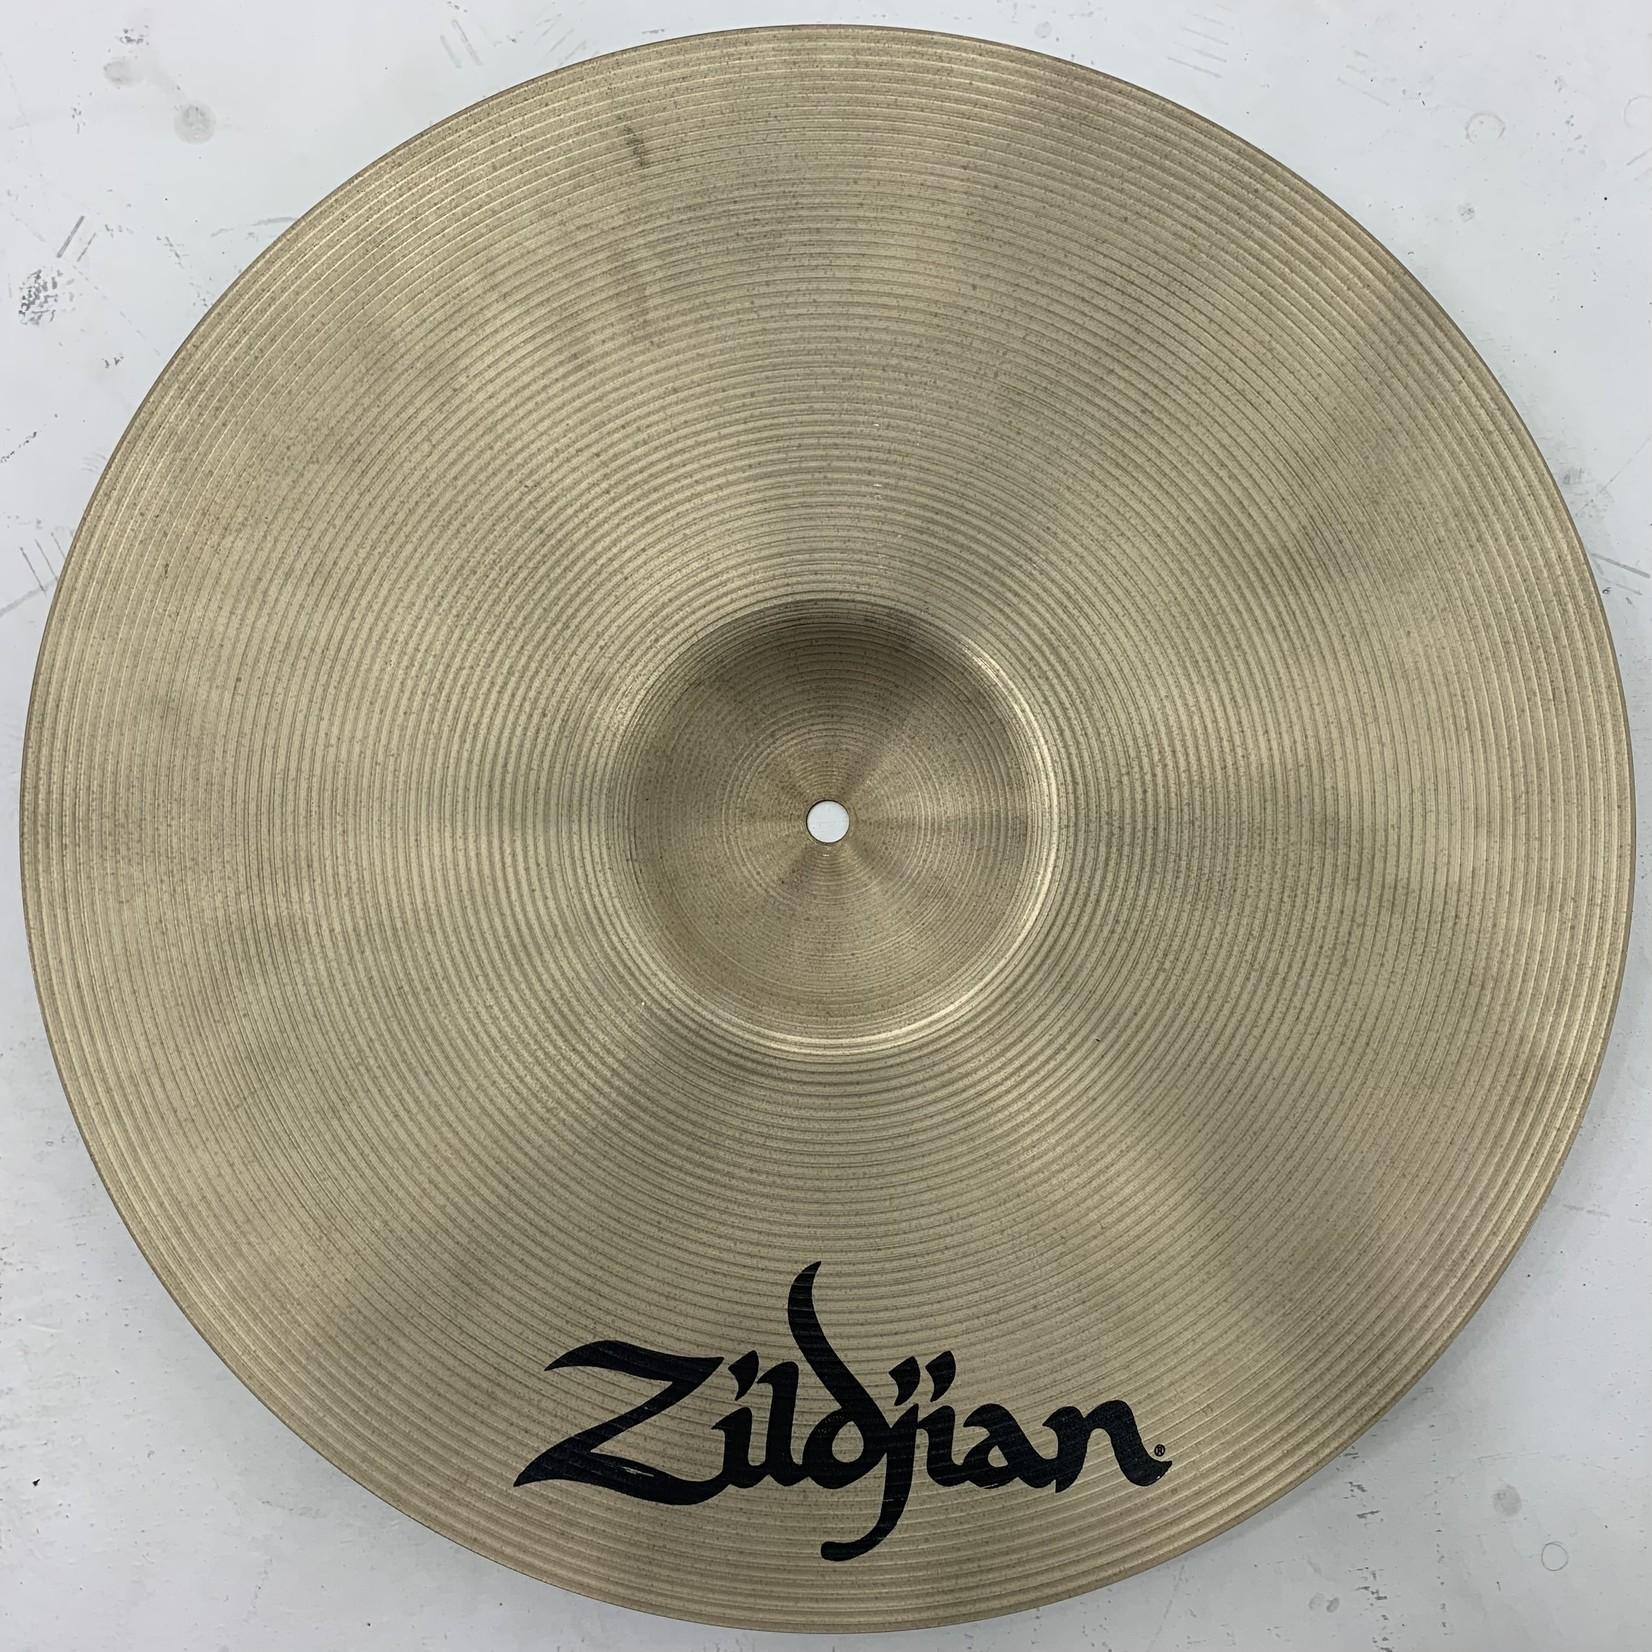 "USED Zildjian A 18"" Rock Crash Cymbal #2 (Michael Wagener Collection)"